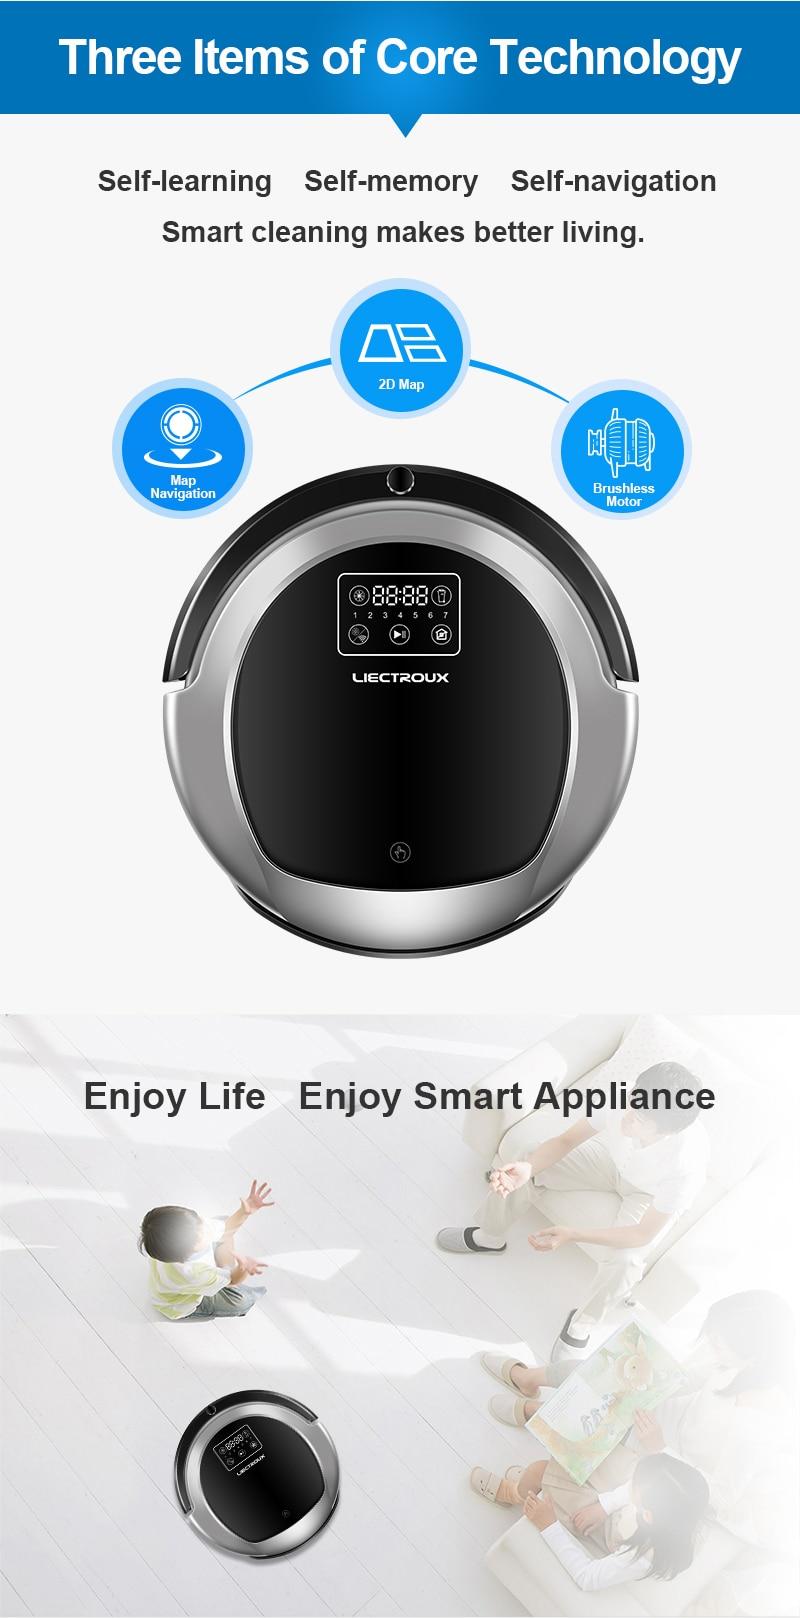 HTB1Di3HPpzqK1RjSZFvq6AB7VXa7 (FBA)LIECTROUX Robot Vacuum Cleaner B6009,Map Navigation,Smart Memory,Suction 3000pa,Dual UV Lamp,Wet Dry Mop,Wifi App aspirador